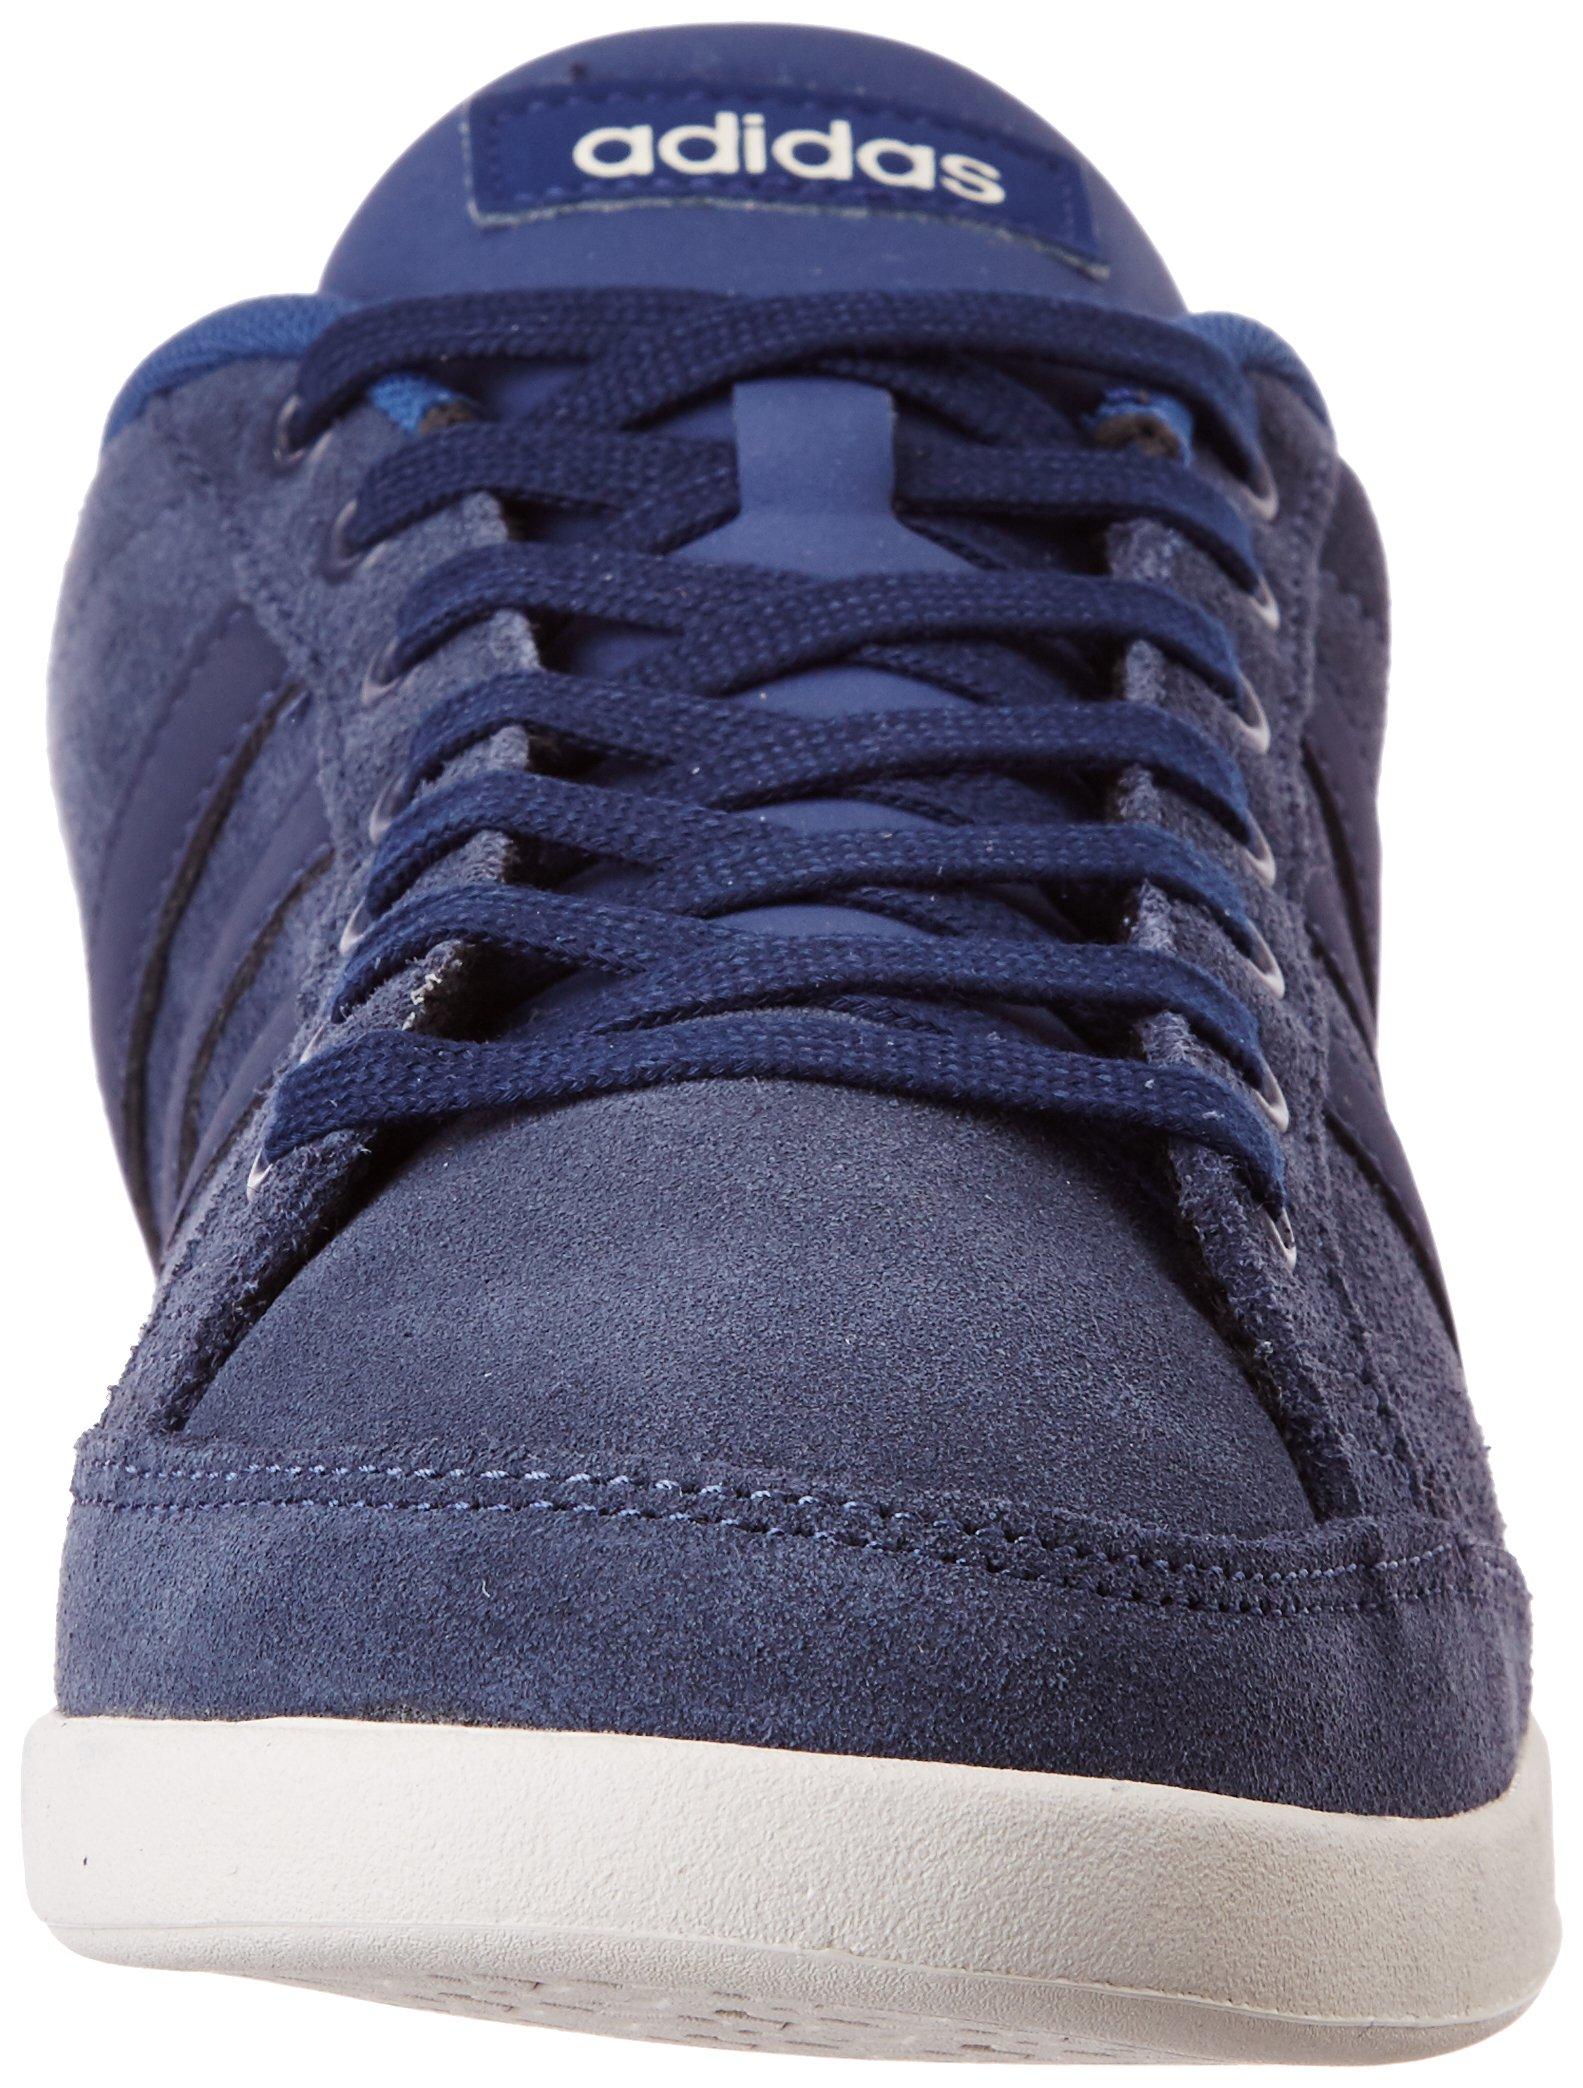 mago tela reaccionar  Adidas Caflaire Sneaker for Men- Buy Online in Antigua and Barbuda at  antigua.desertcart.com. ProductId : 221544554.